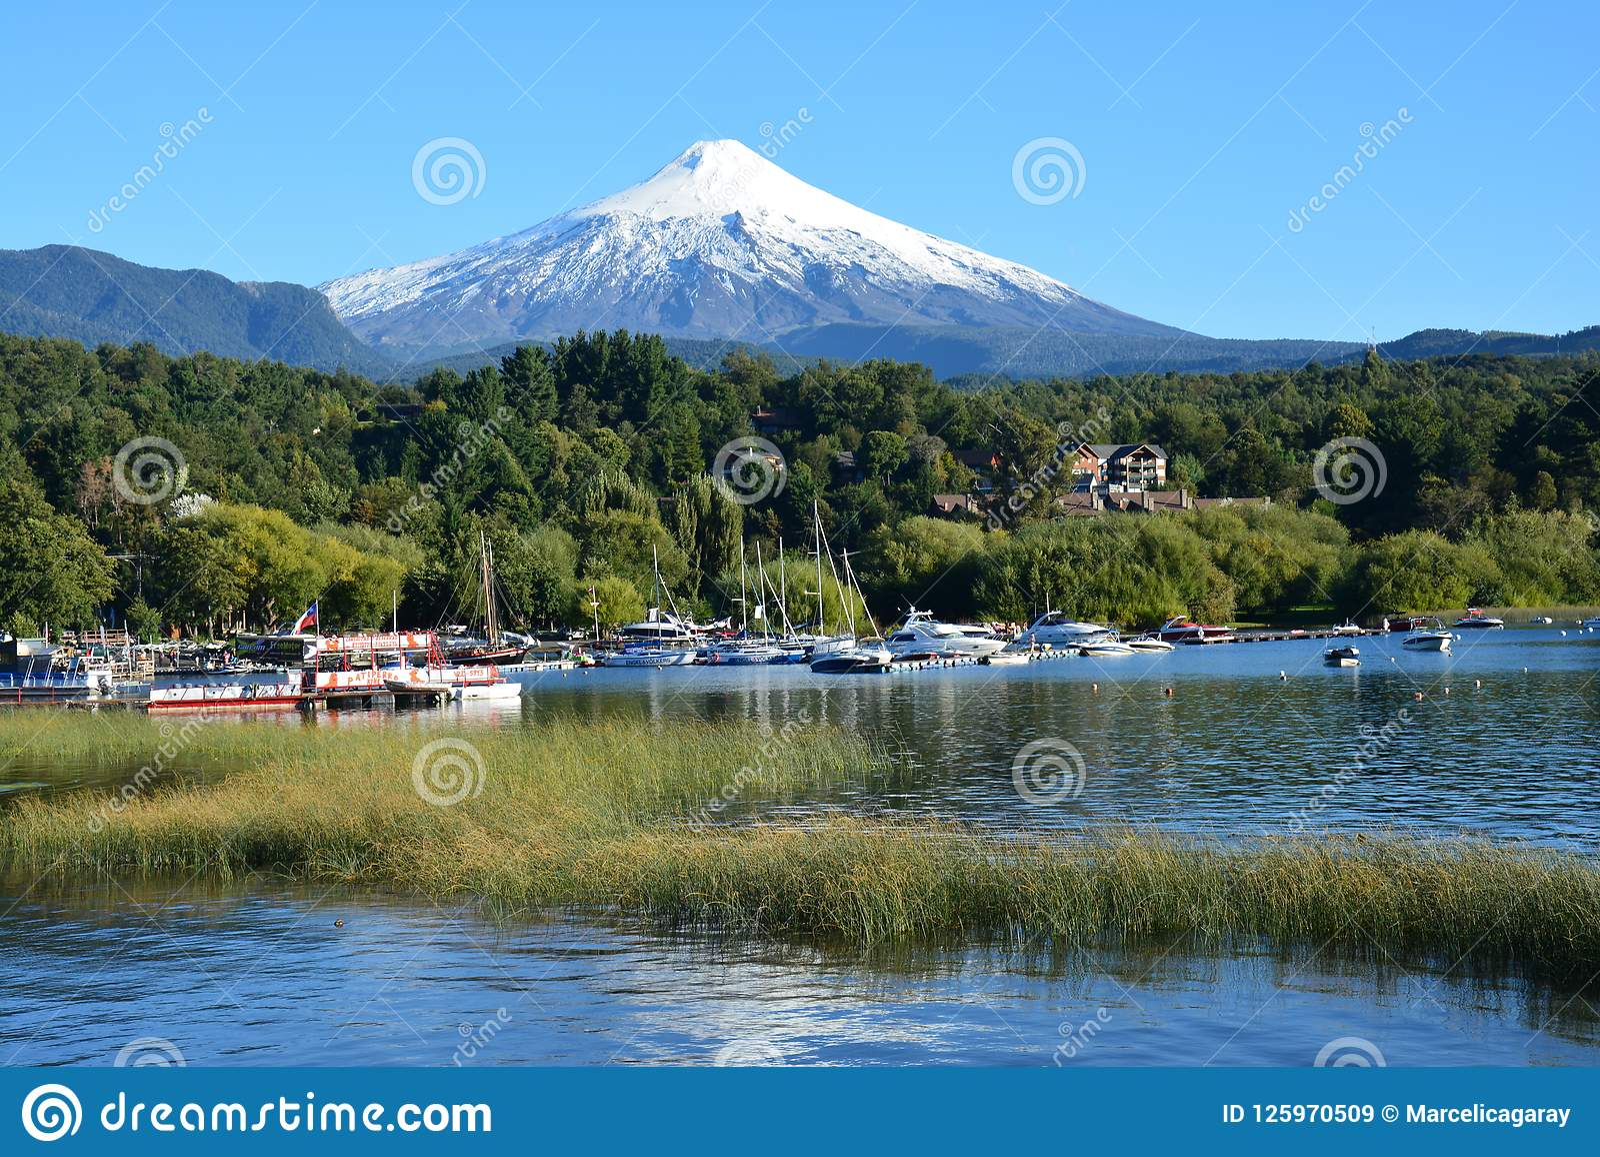 Villaricavulkaan in Pucon, Chili